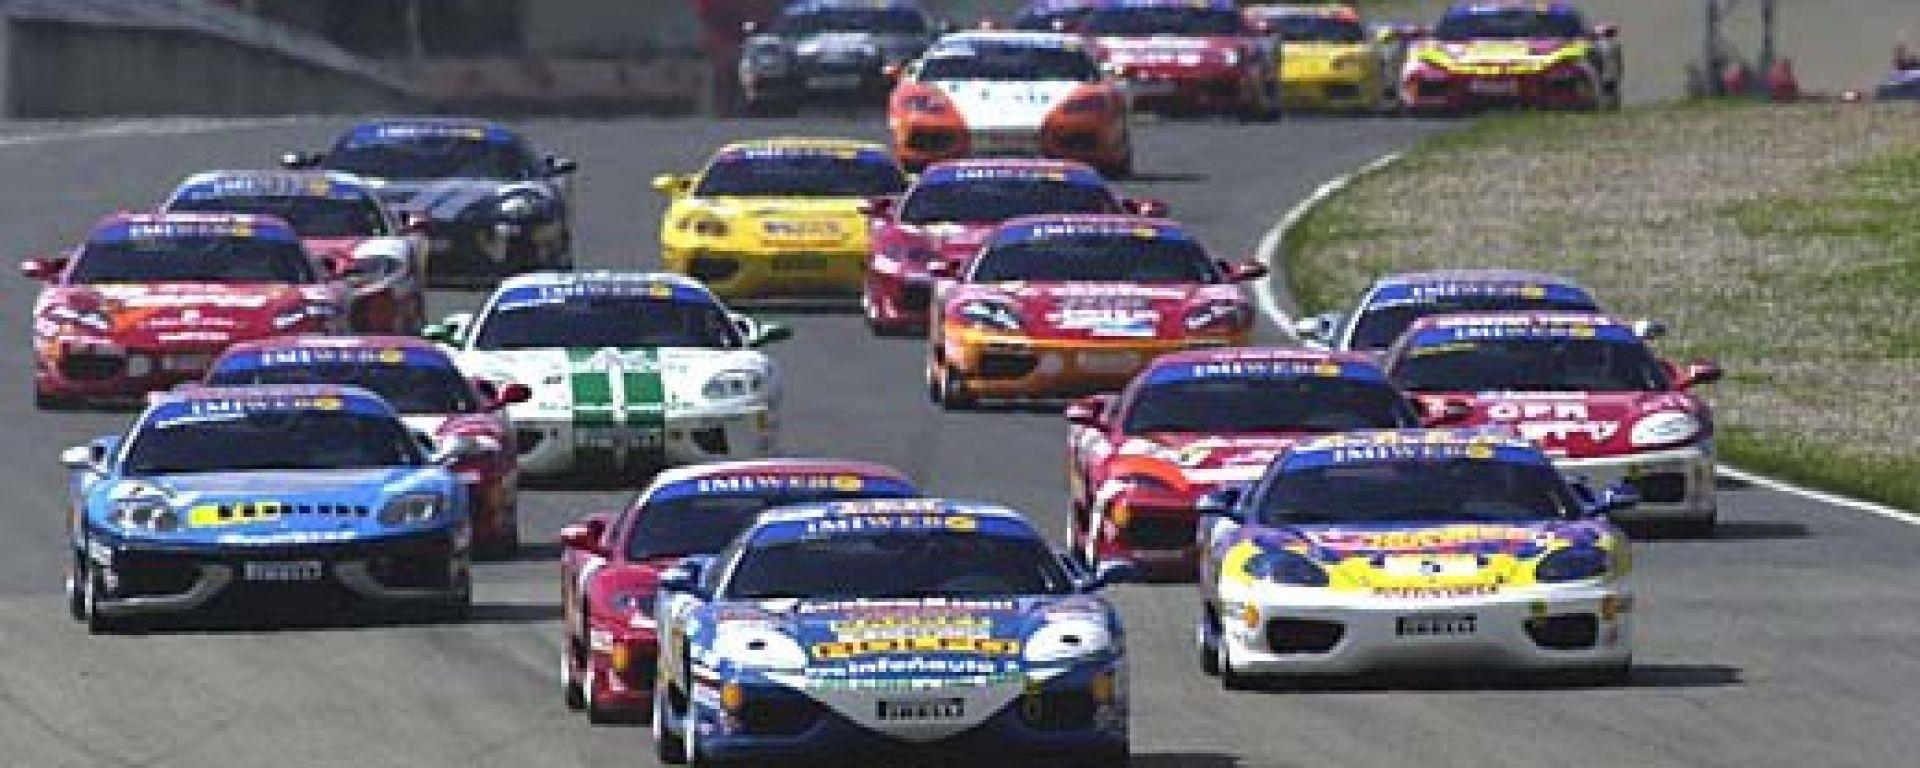 Festa Ferrari a Monza